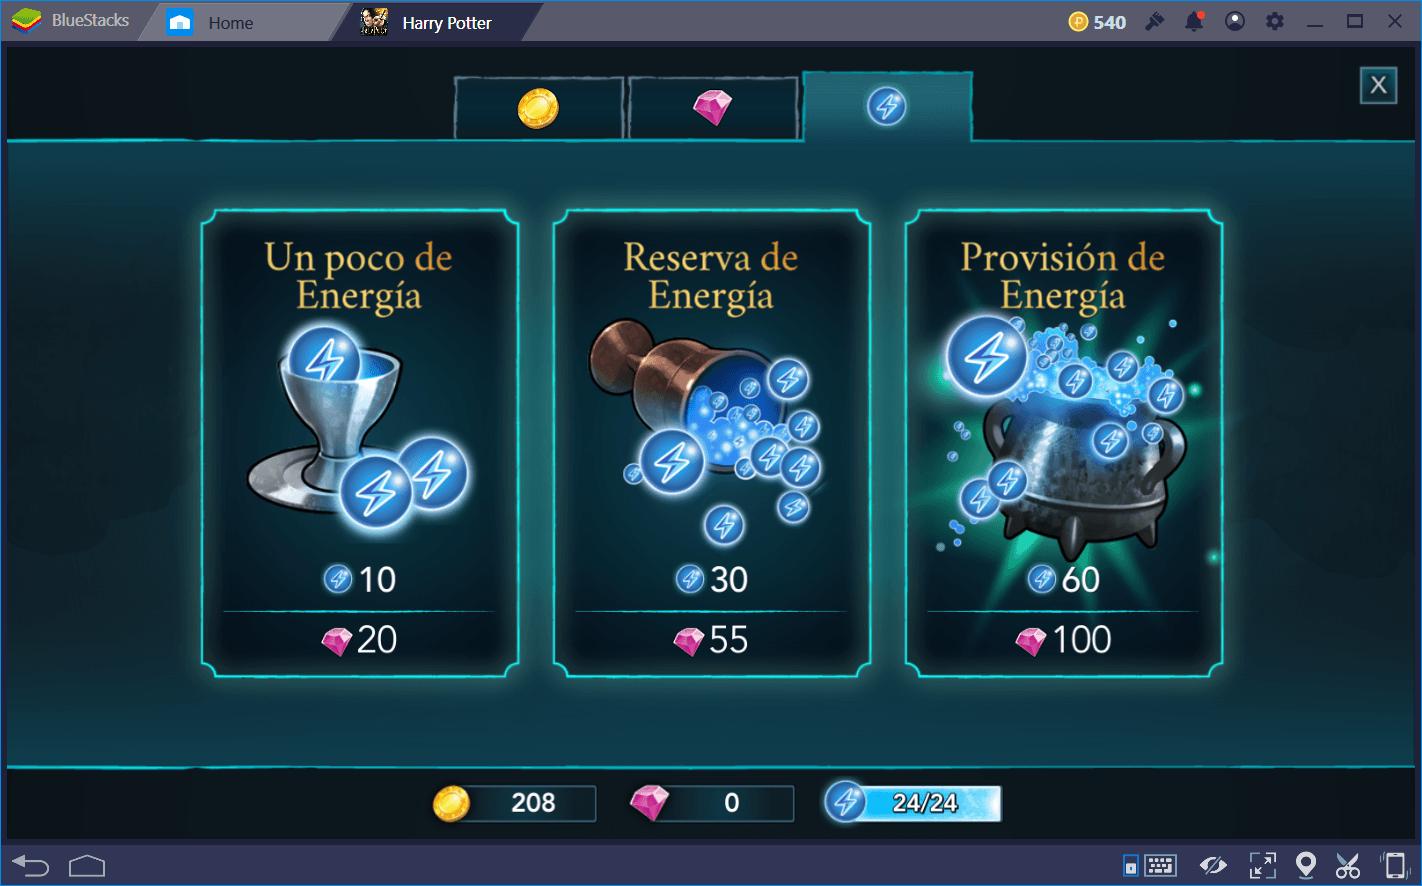 Como Administrar Tu Energia En Harry Potter Hogwarts Mystery